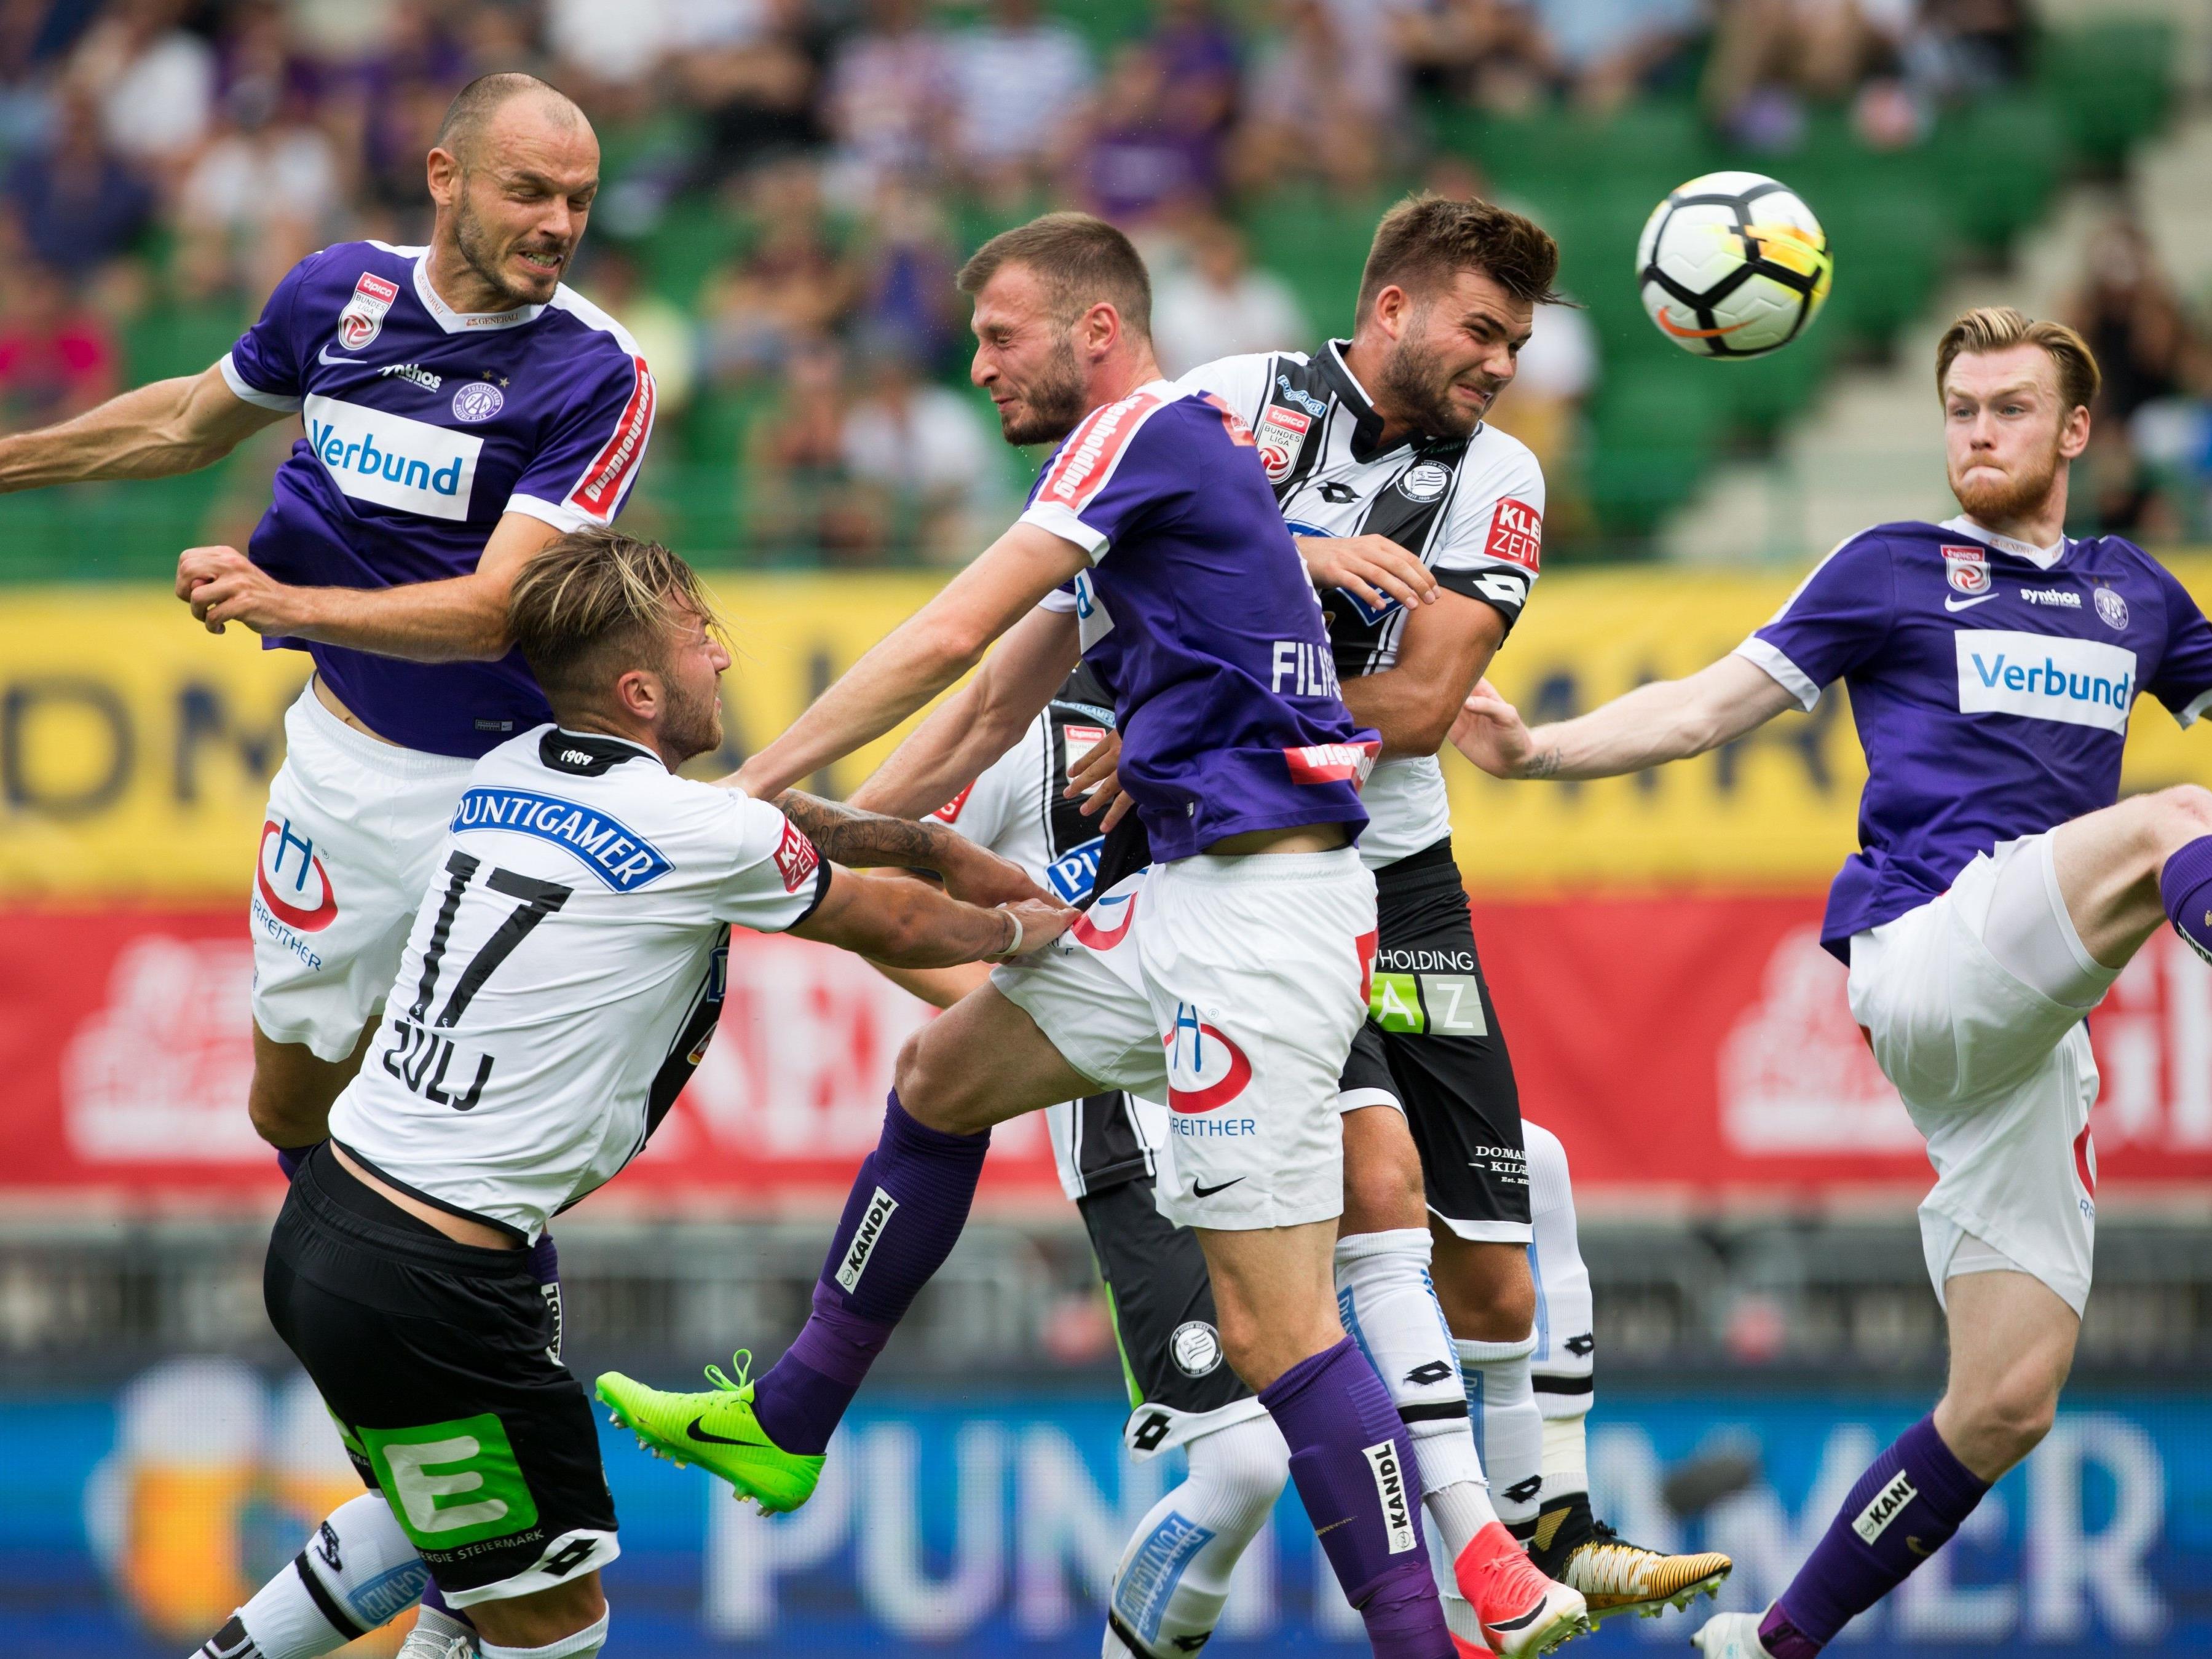 Die Wiener Austria hat gegen Sturm Graz mit 2:3 verloren.